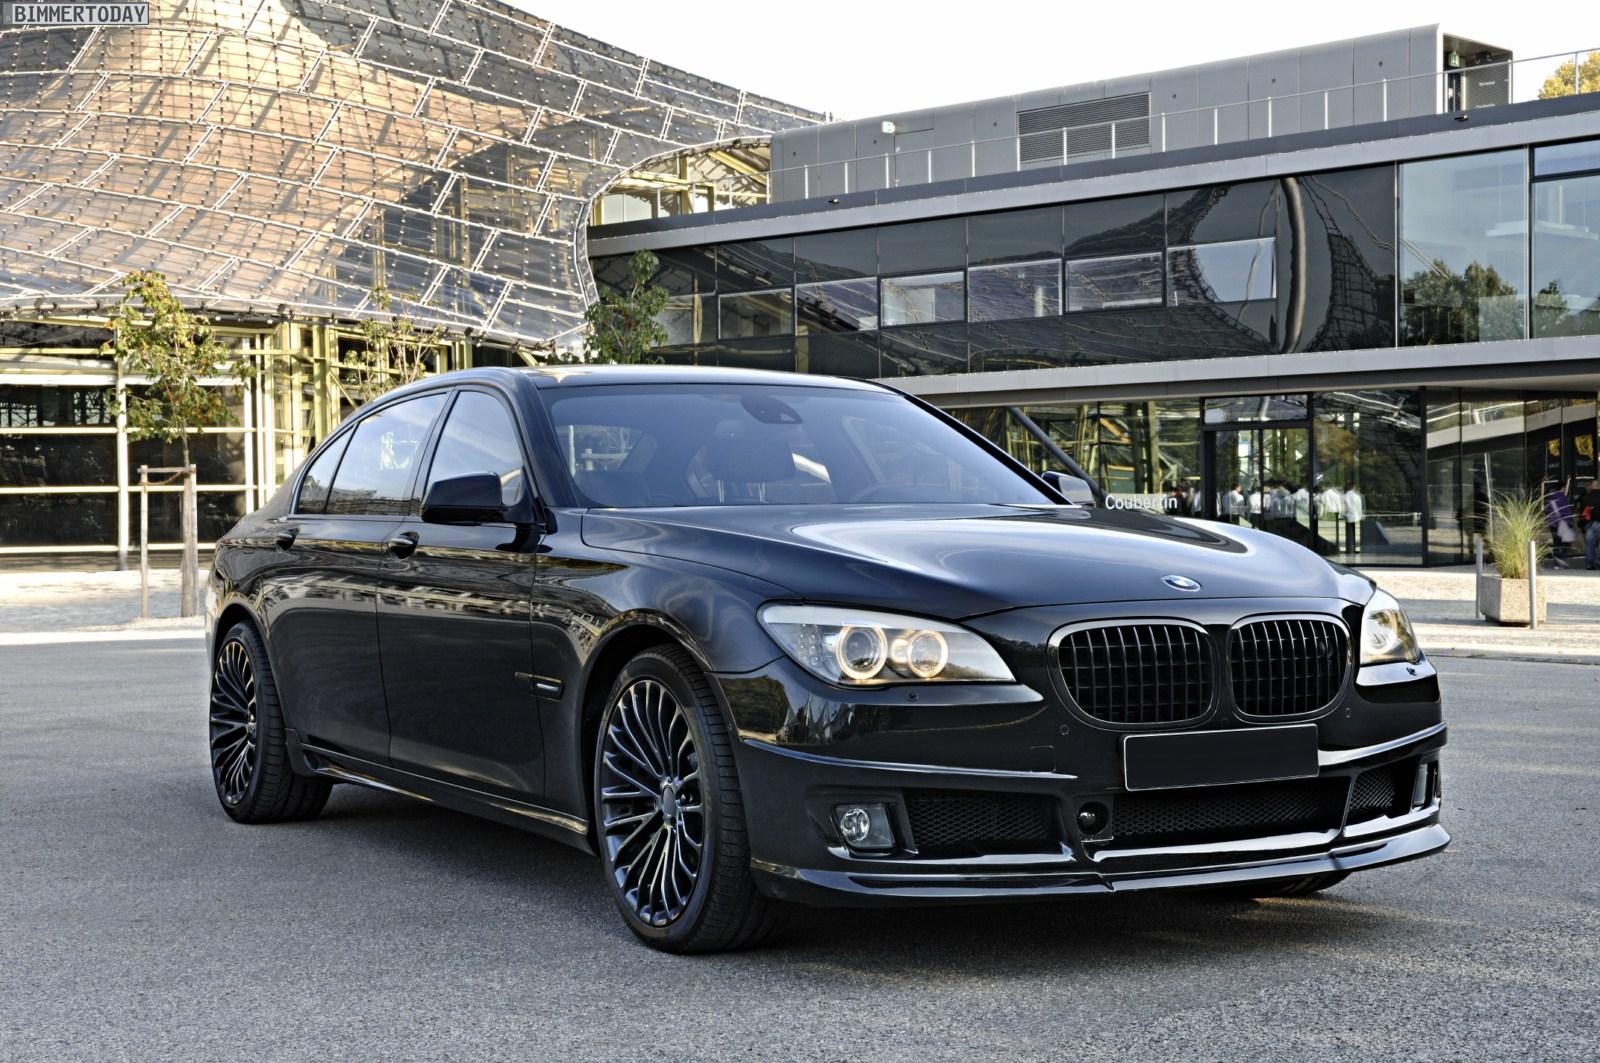 Bmw 750i 2015 >> 720 PS: TuningWerk NR 7s auf Basis der BMW 7er Langversion F02